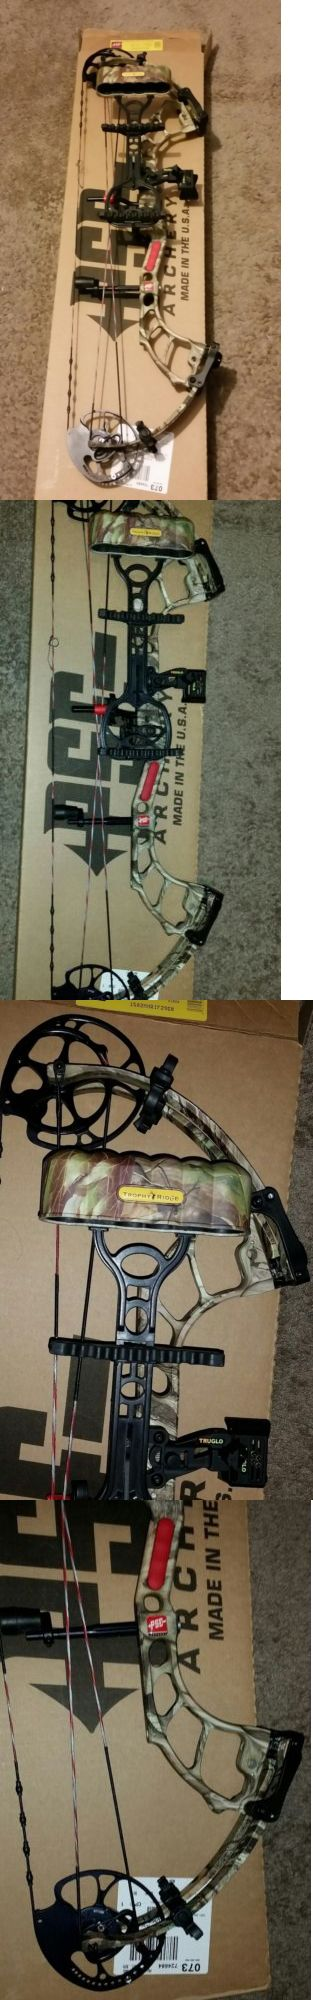 Compound 20838: Pse Bow Madness 32 Break-Up Infinity 70Lb Rh -> BUY IT NOW ONLY: $400 on eBay!